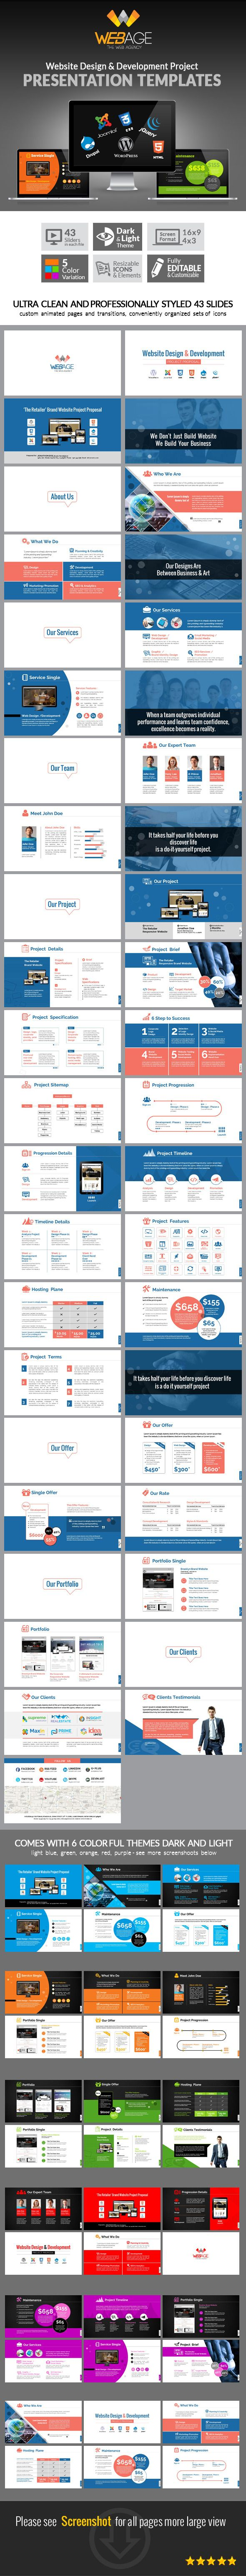 web design & development project presentation - business, Presentation templates